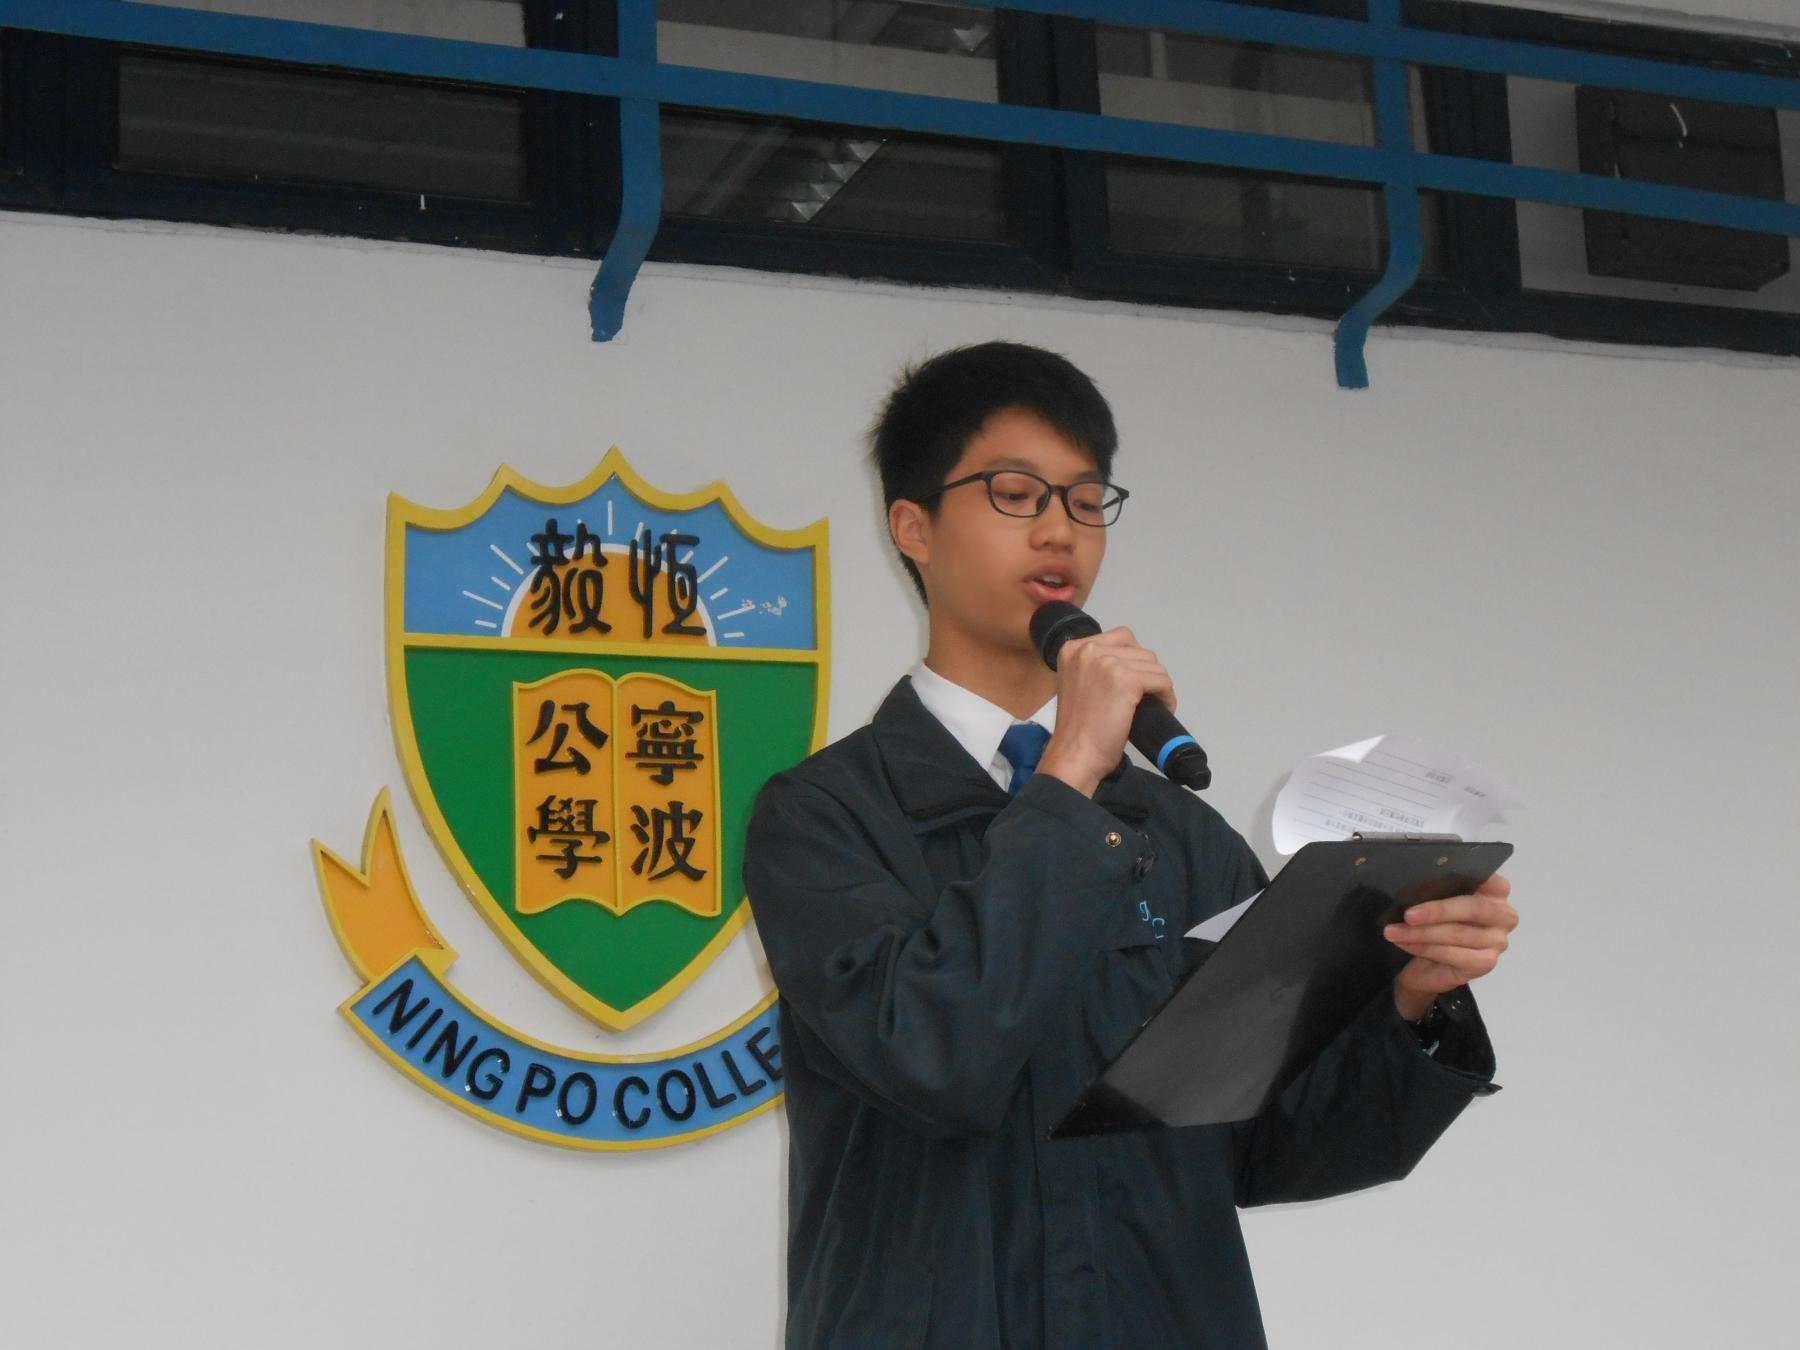 http://www.npc.edu.hk/sites/default/files/dscn9018_2.jpg